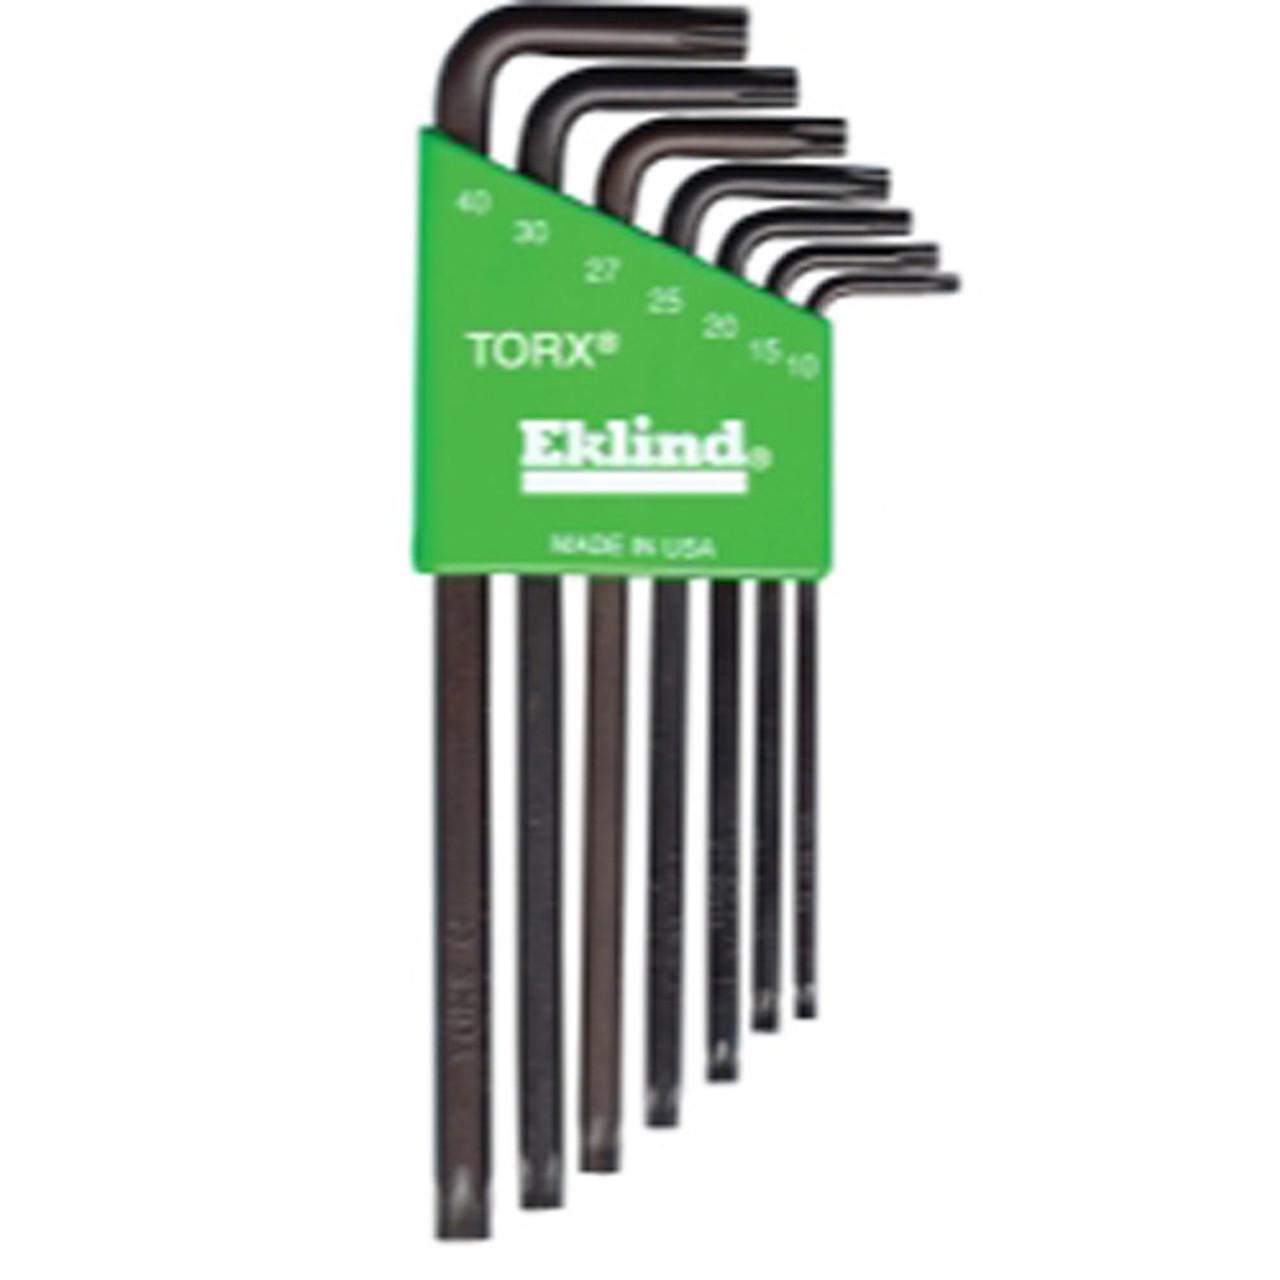 Eklind Tool Company 10907 7 Piece Long Torx L-key Set